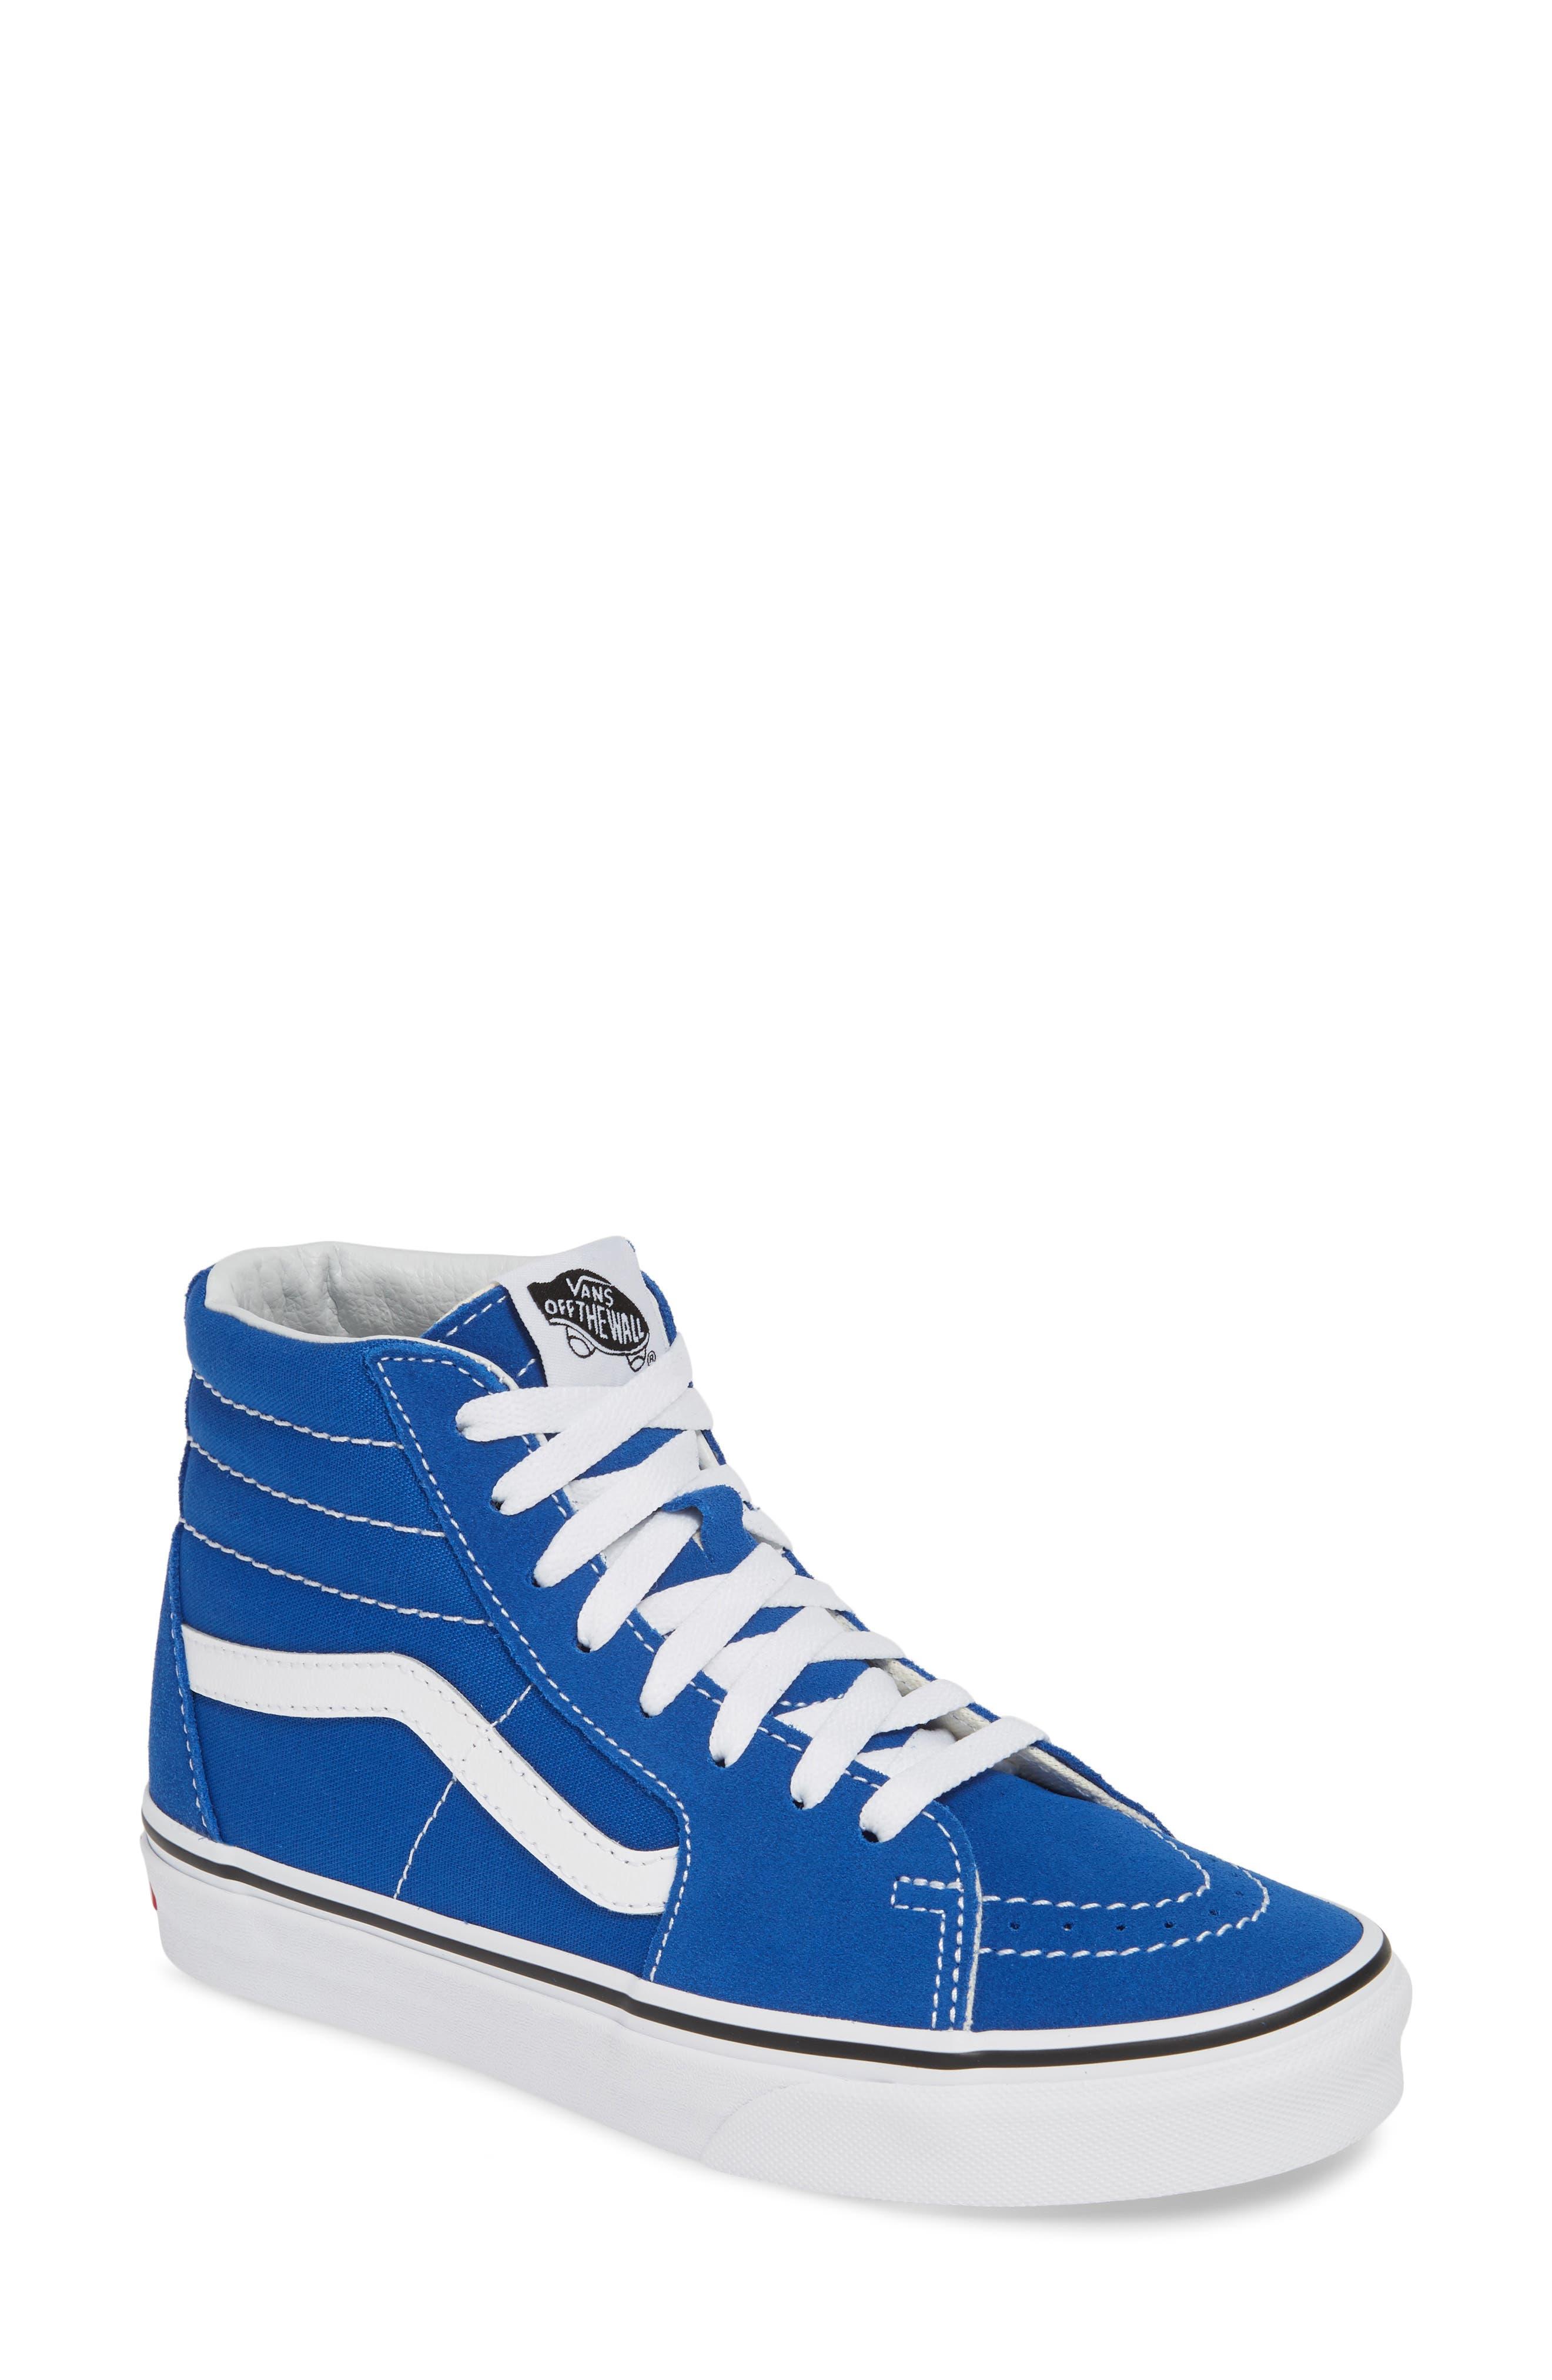 ed016d0d18 Women s High Top Sneakers   Running Shoes